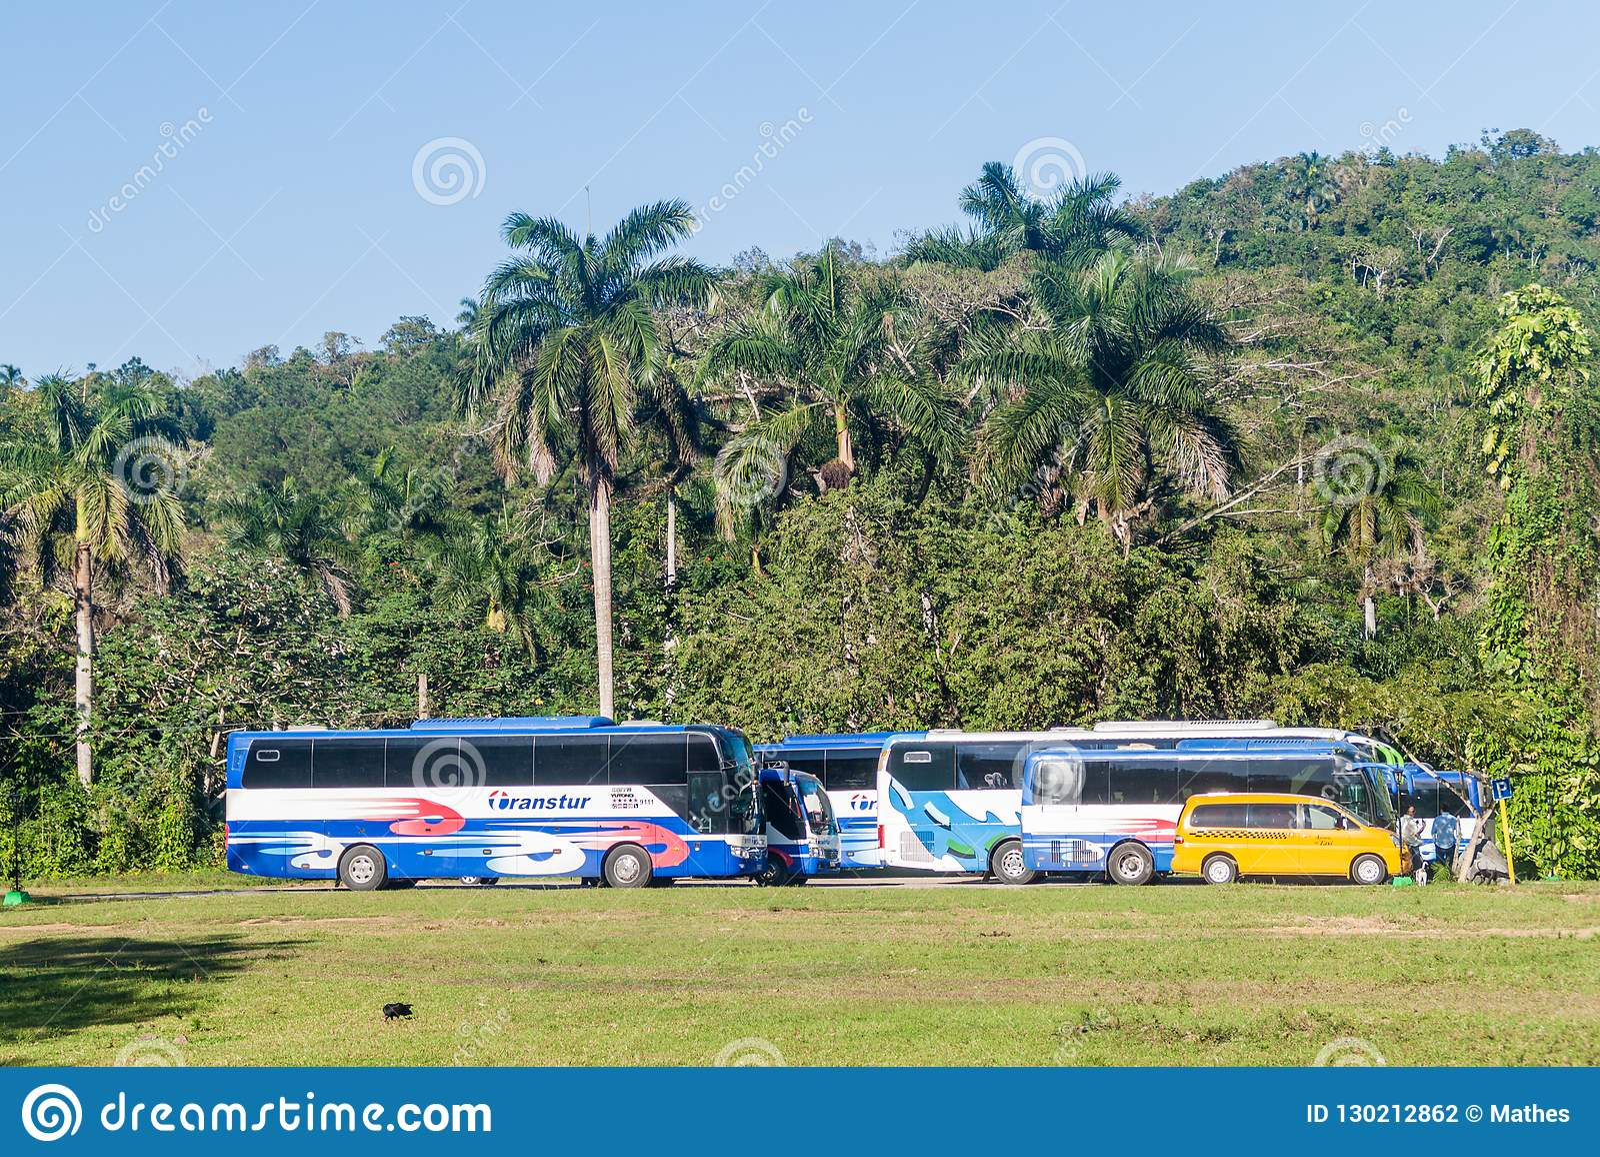 VINALES, CUBA - FEB 18, 2016: Tour buses at the entrance to Cueva del Indio cave in Vinales valley, Cub